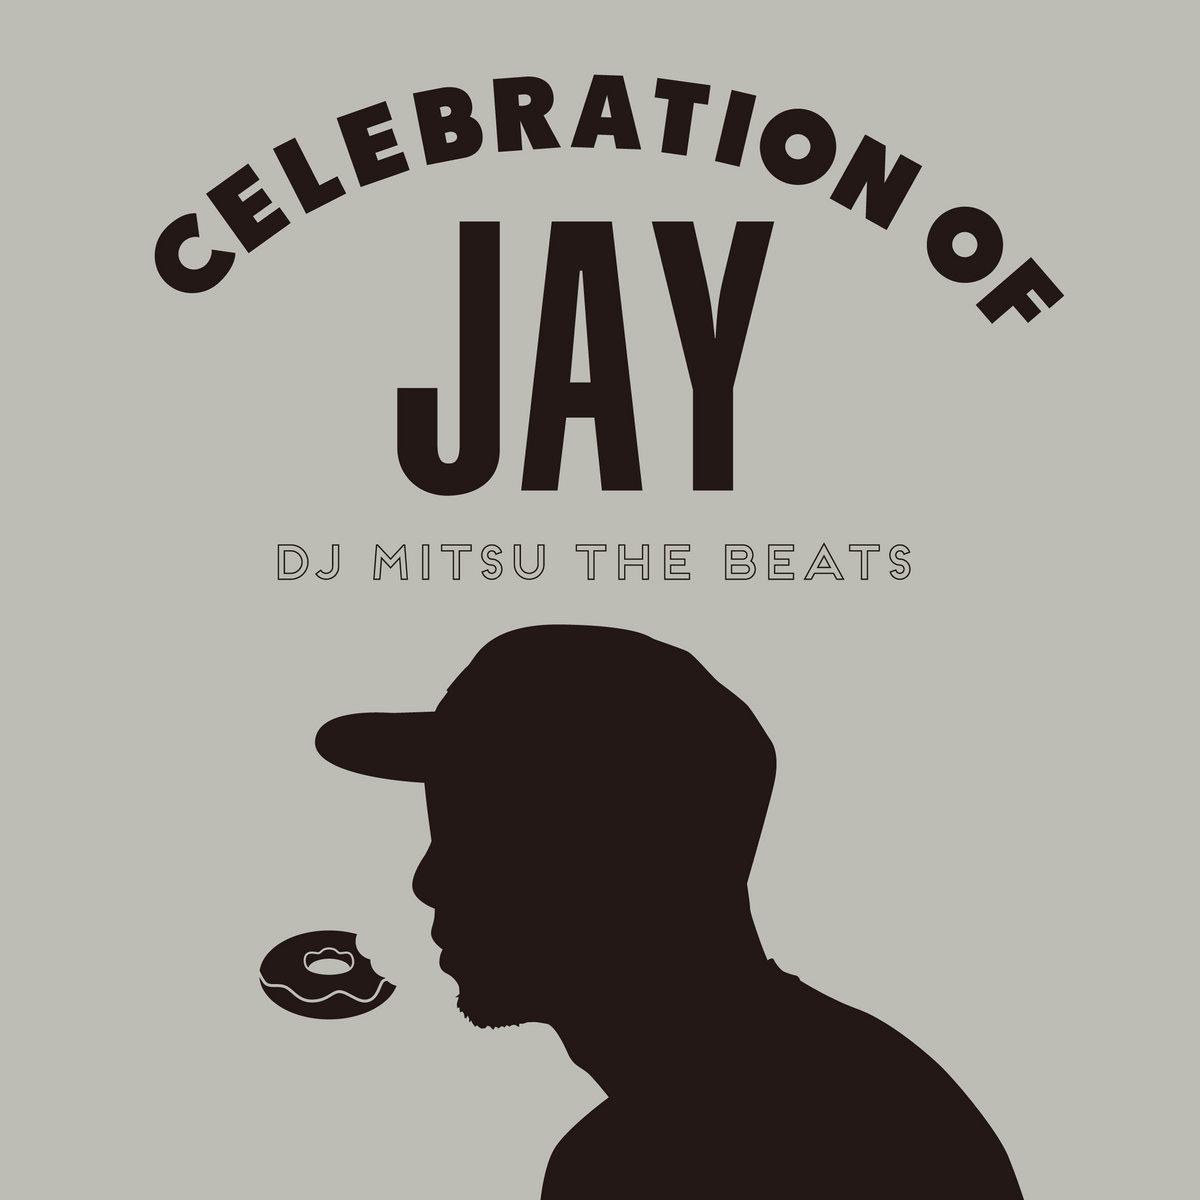 Celebration of Jay | dj mitsu ...